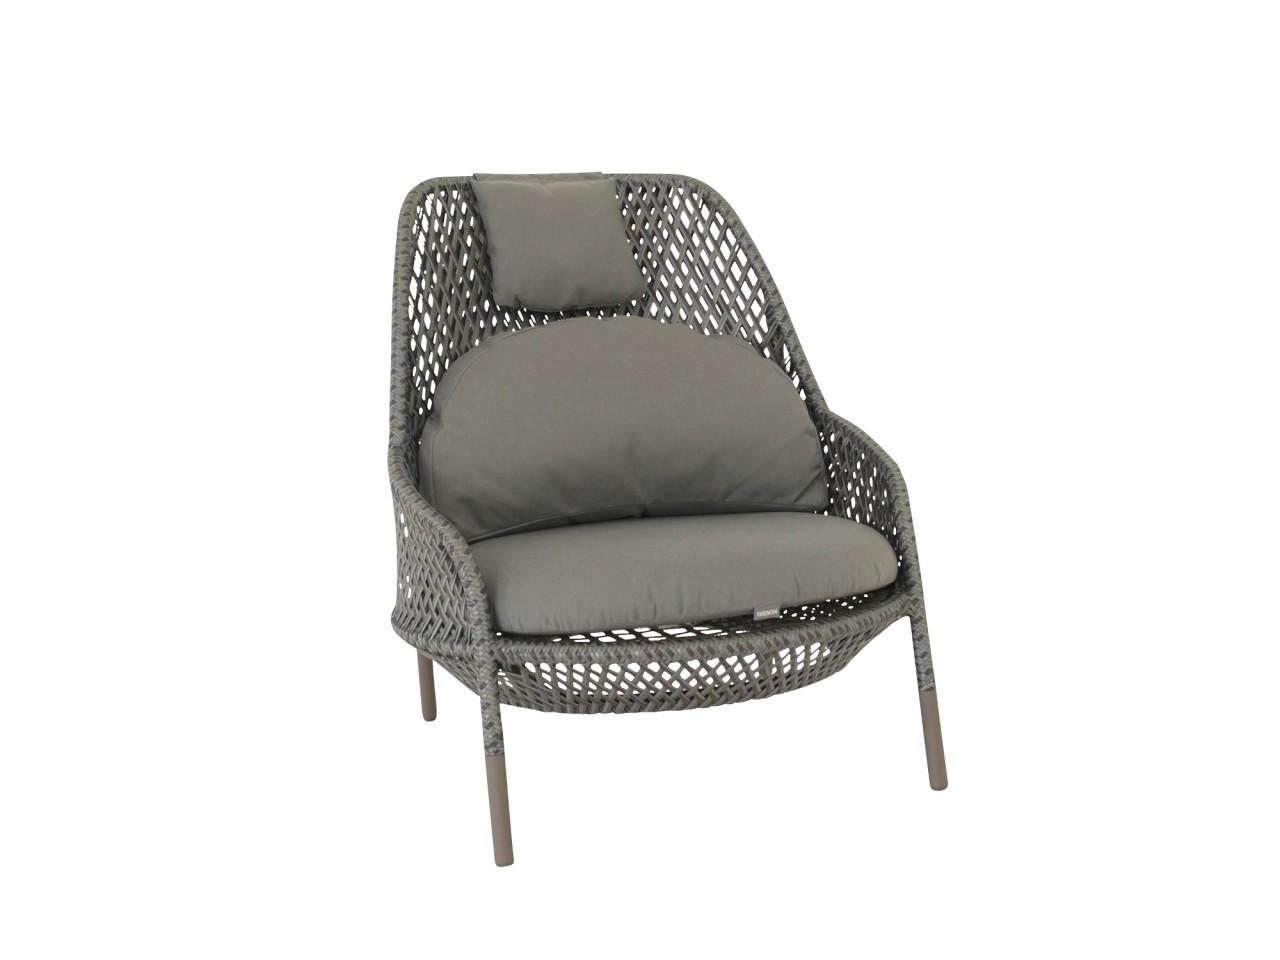 Dedon AHNDA Hochlehner Sessel mit Kissen Sessel in der Farbe graphit